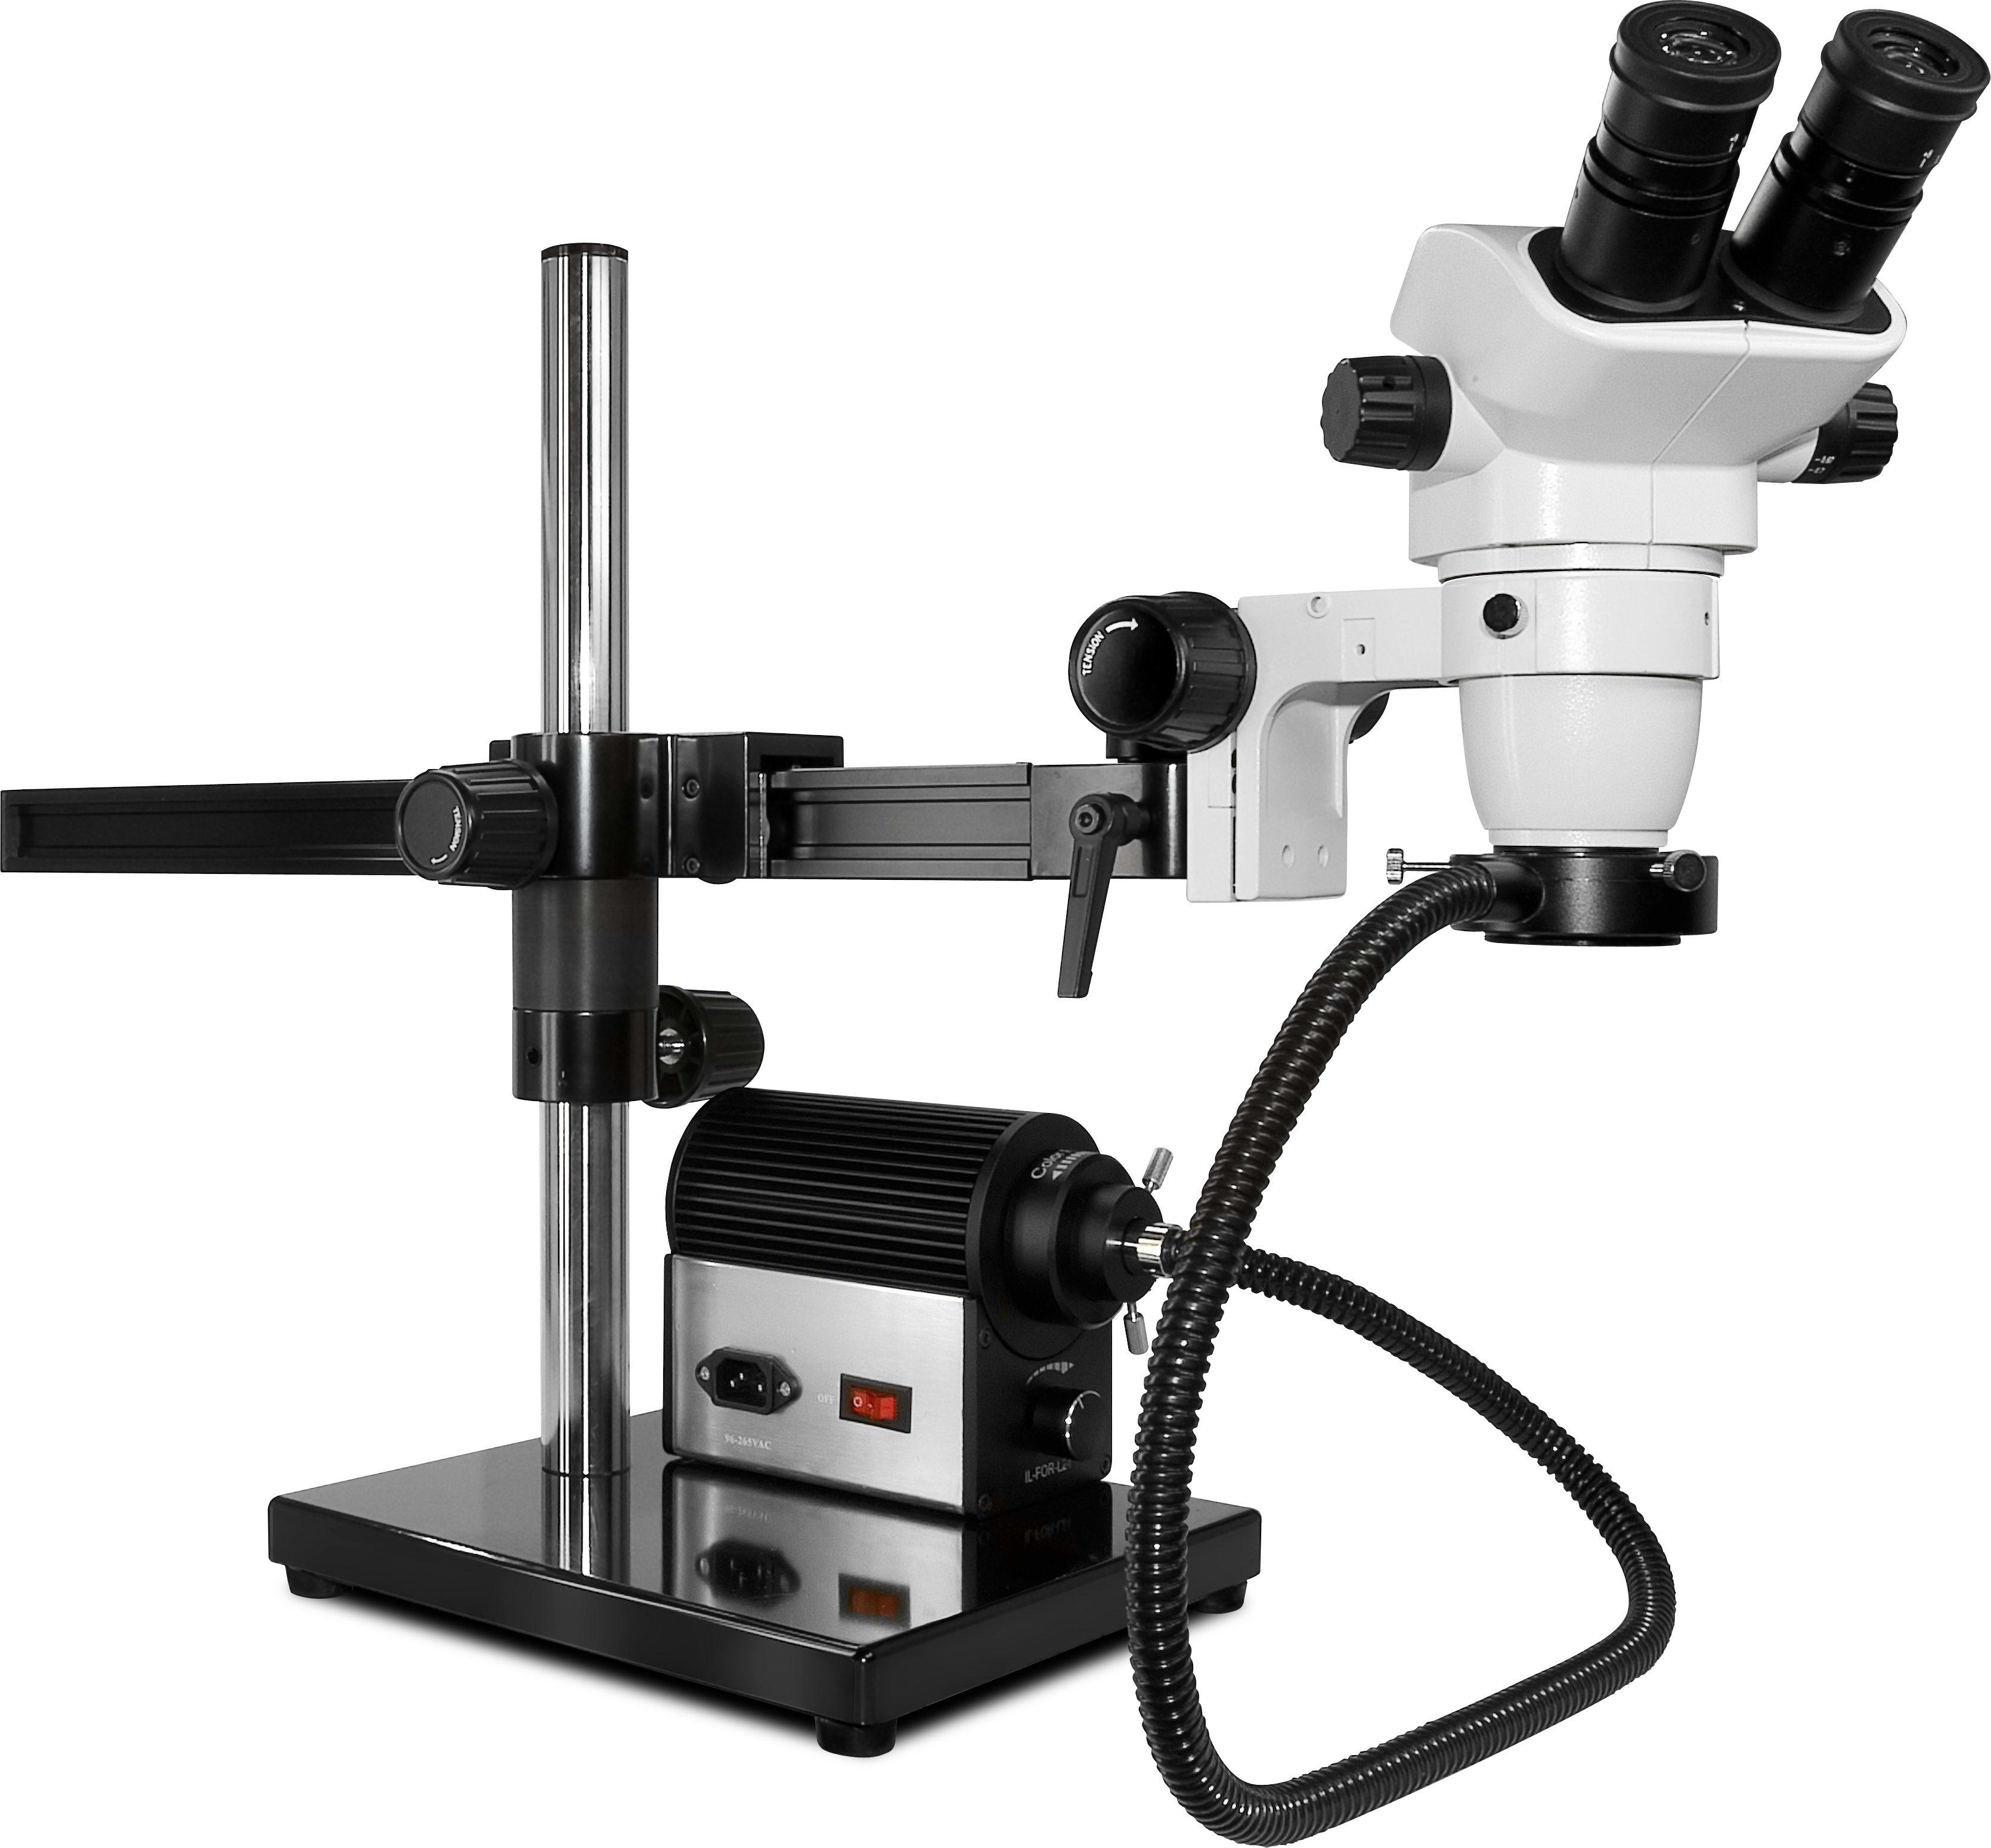 Stereo Zoom Binocular Microscope Inspection System P//N NZ-PK3FX-R3E NZ Series by Scienscope